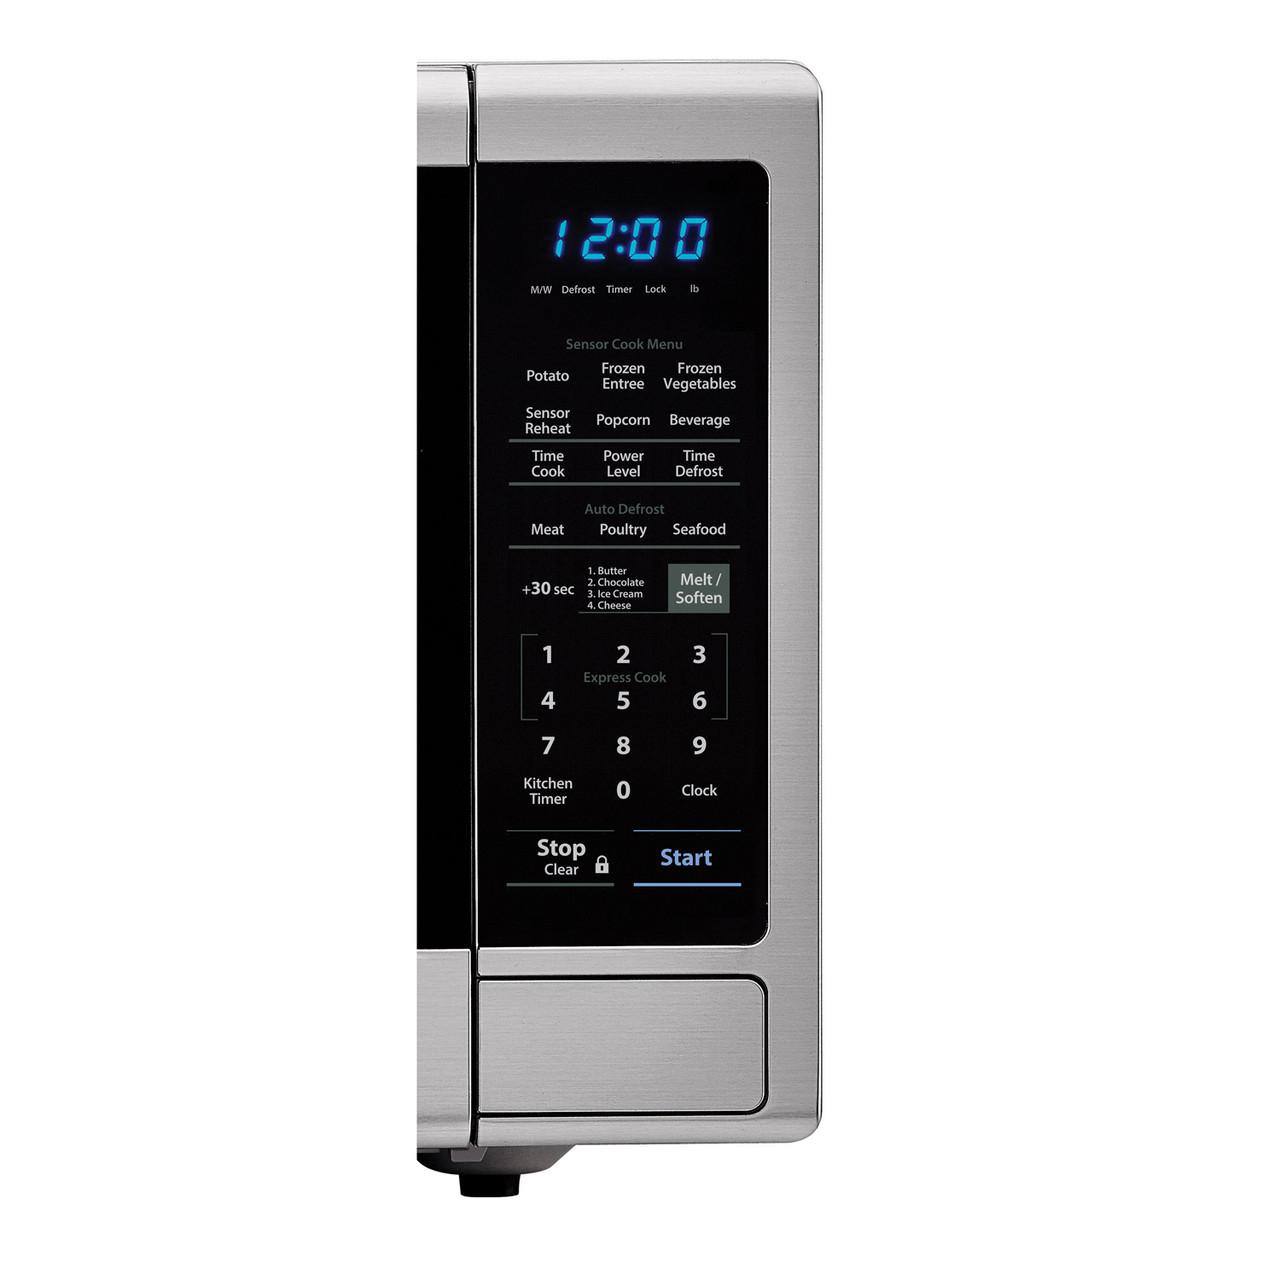 1.8 cu. ft. Sharp Stainless Steel Microwave with Black Mirror Door (SMC1843CM) – control panel